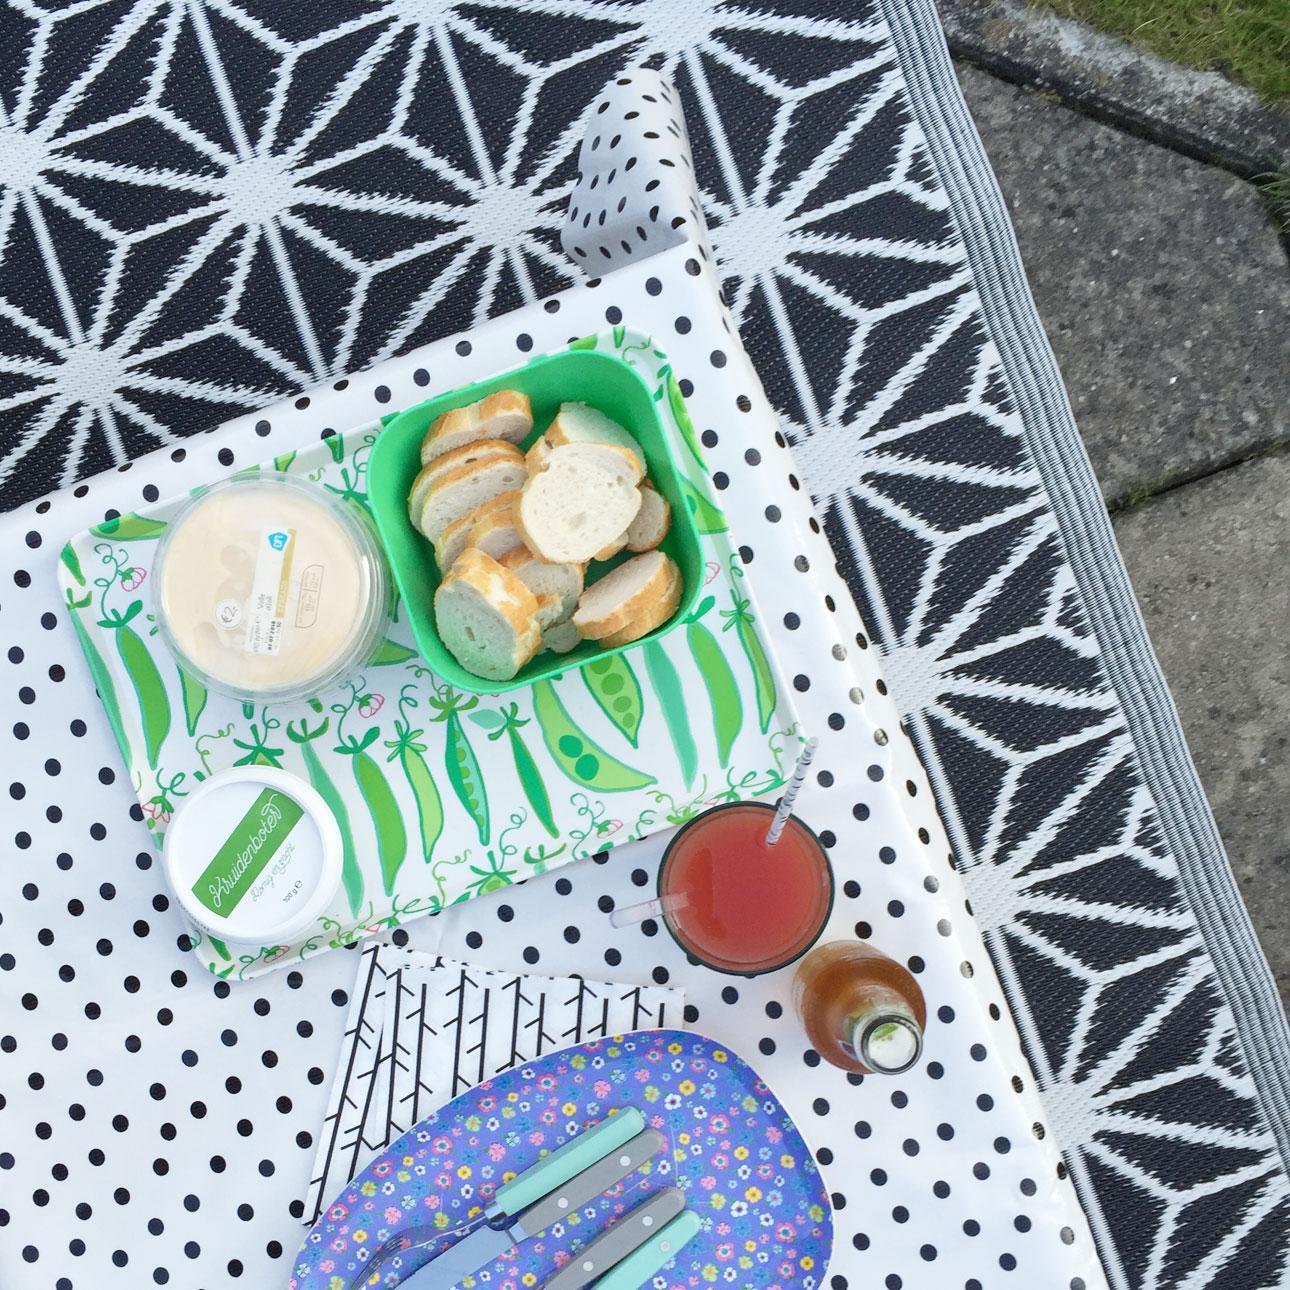 Mamalifestyle juni 2016 buiten eten